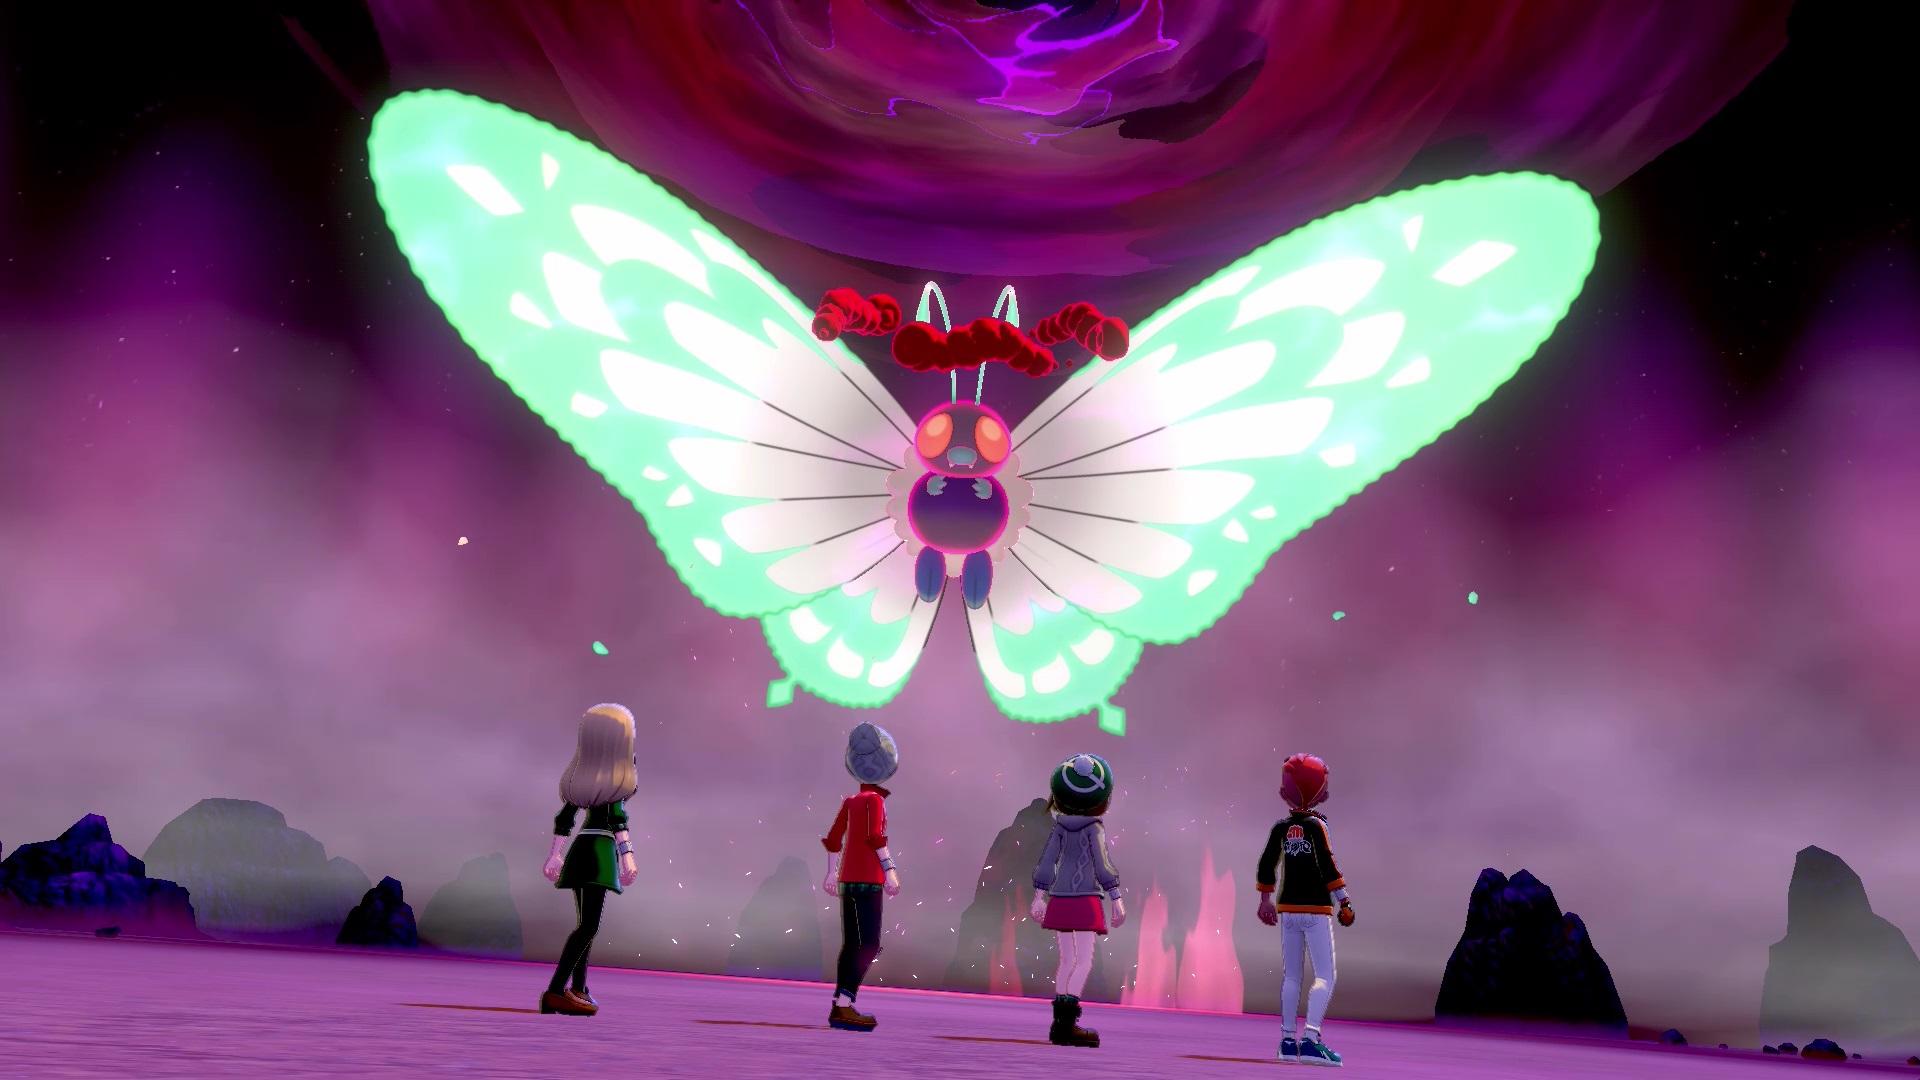 Pokémon-Raid